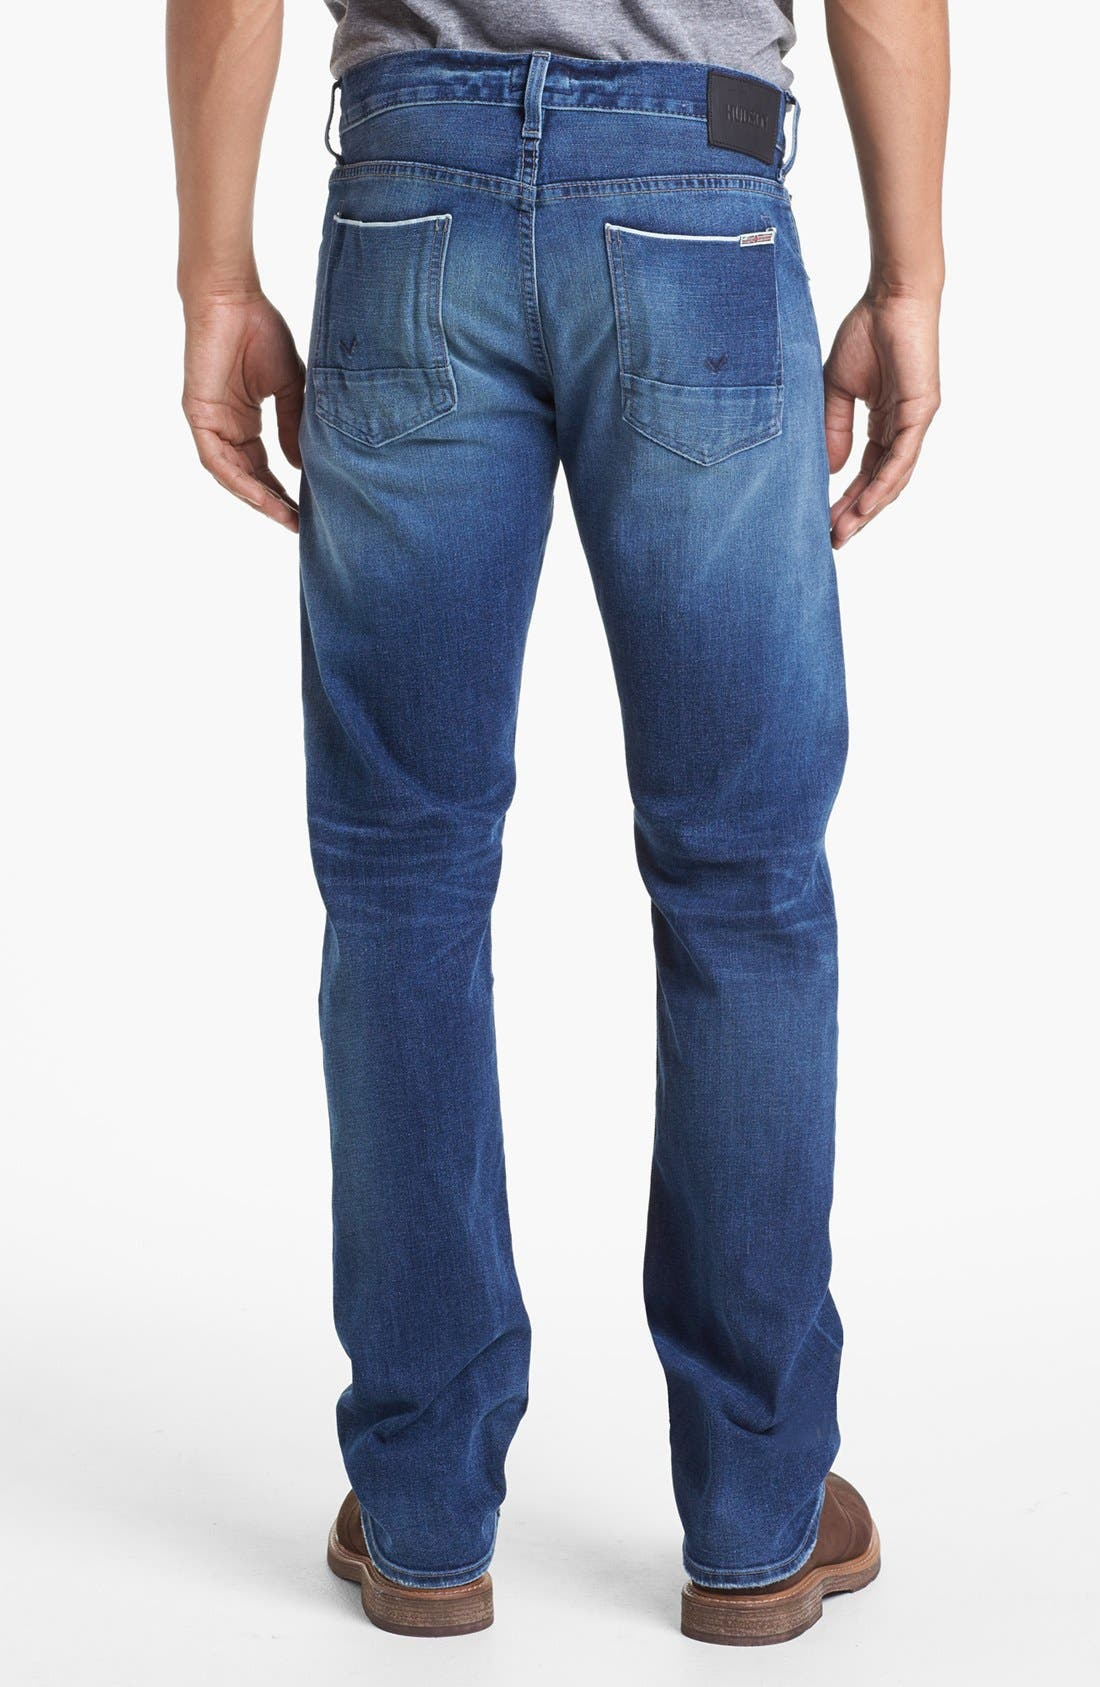 Alternate Image 1 Selected - Hudson Jeans 'Byron' Straight Leg Selvedge Jeans (Belize)